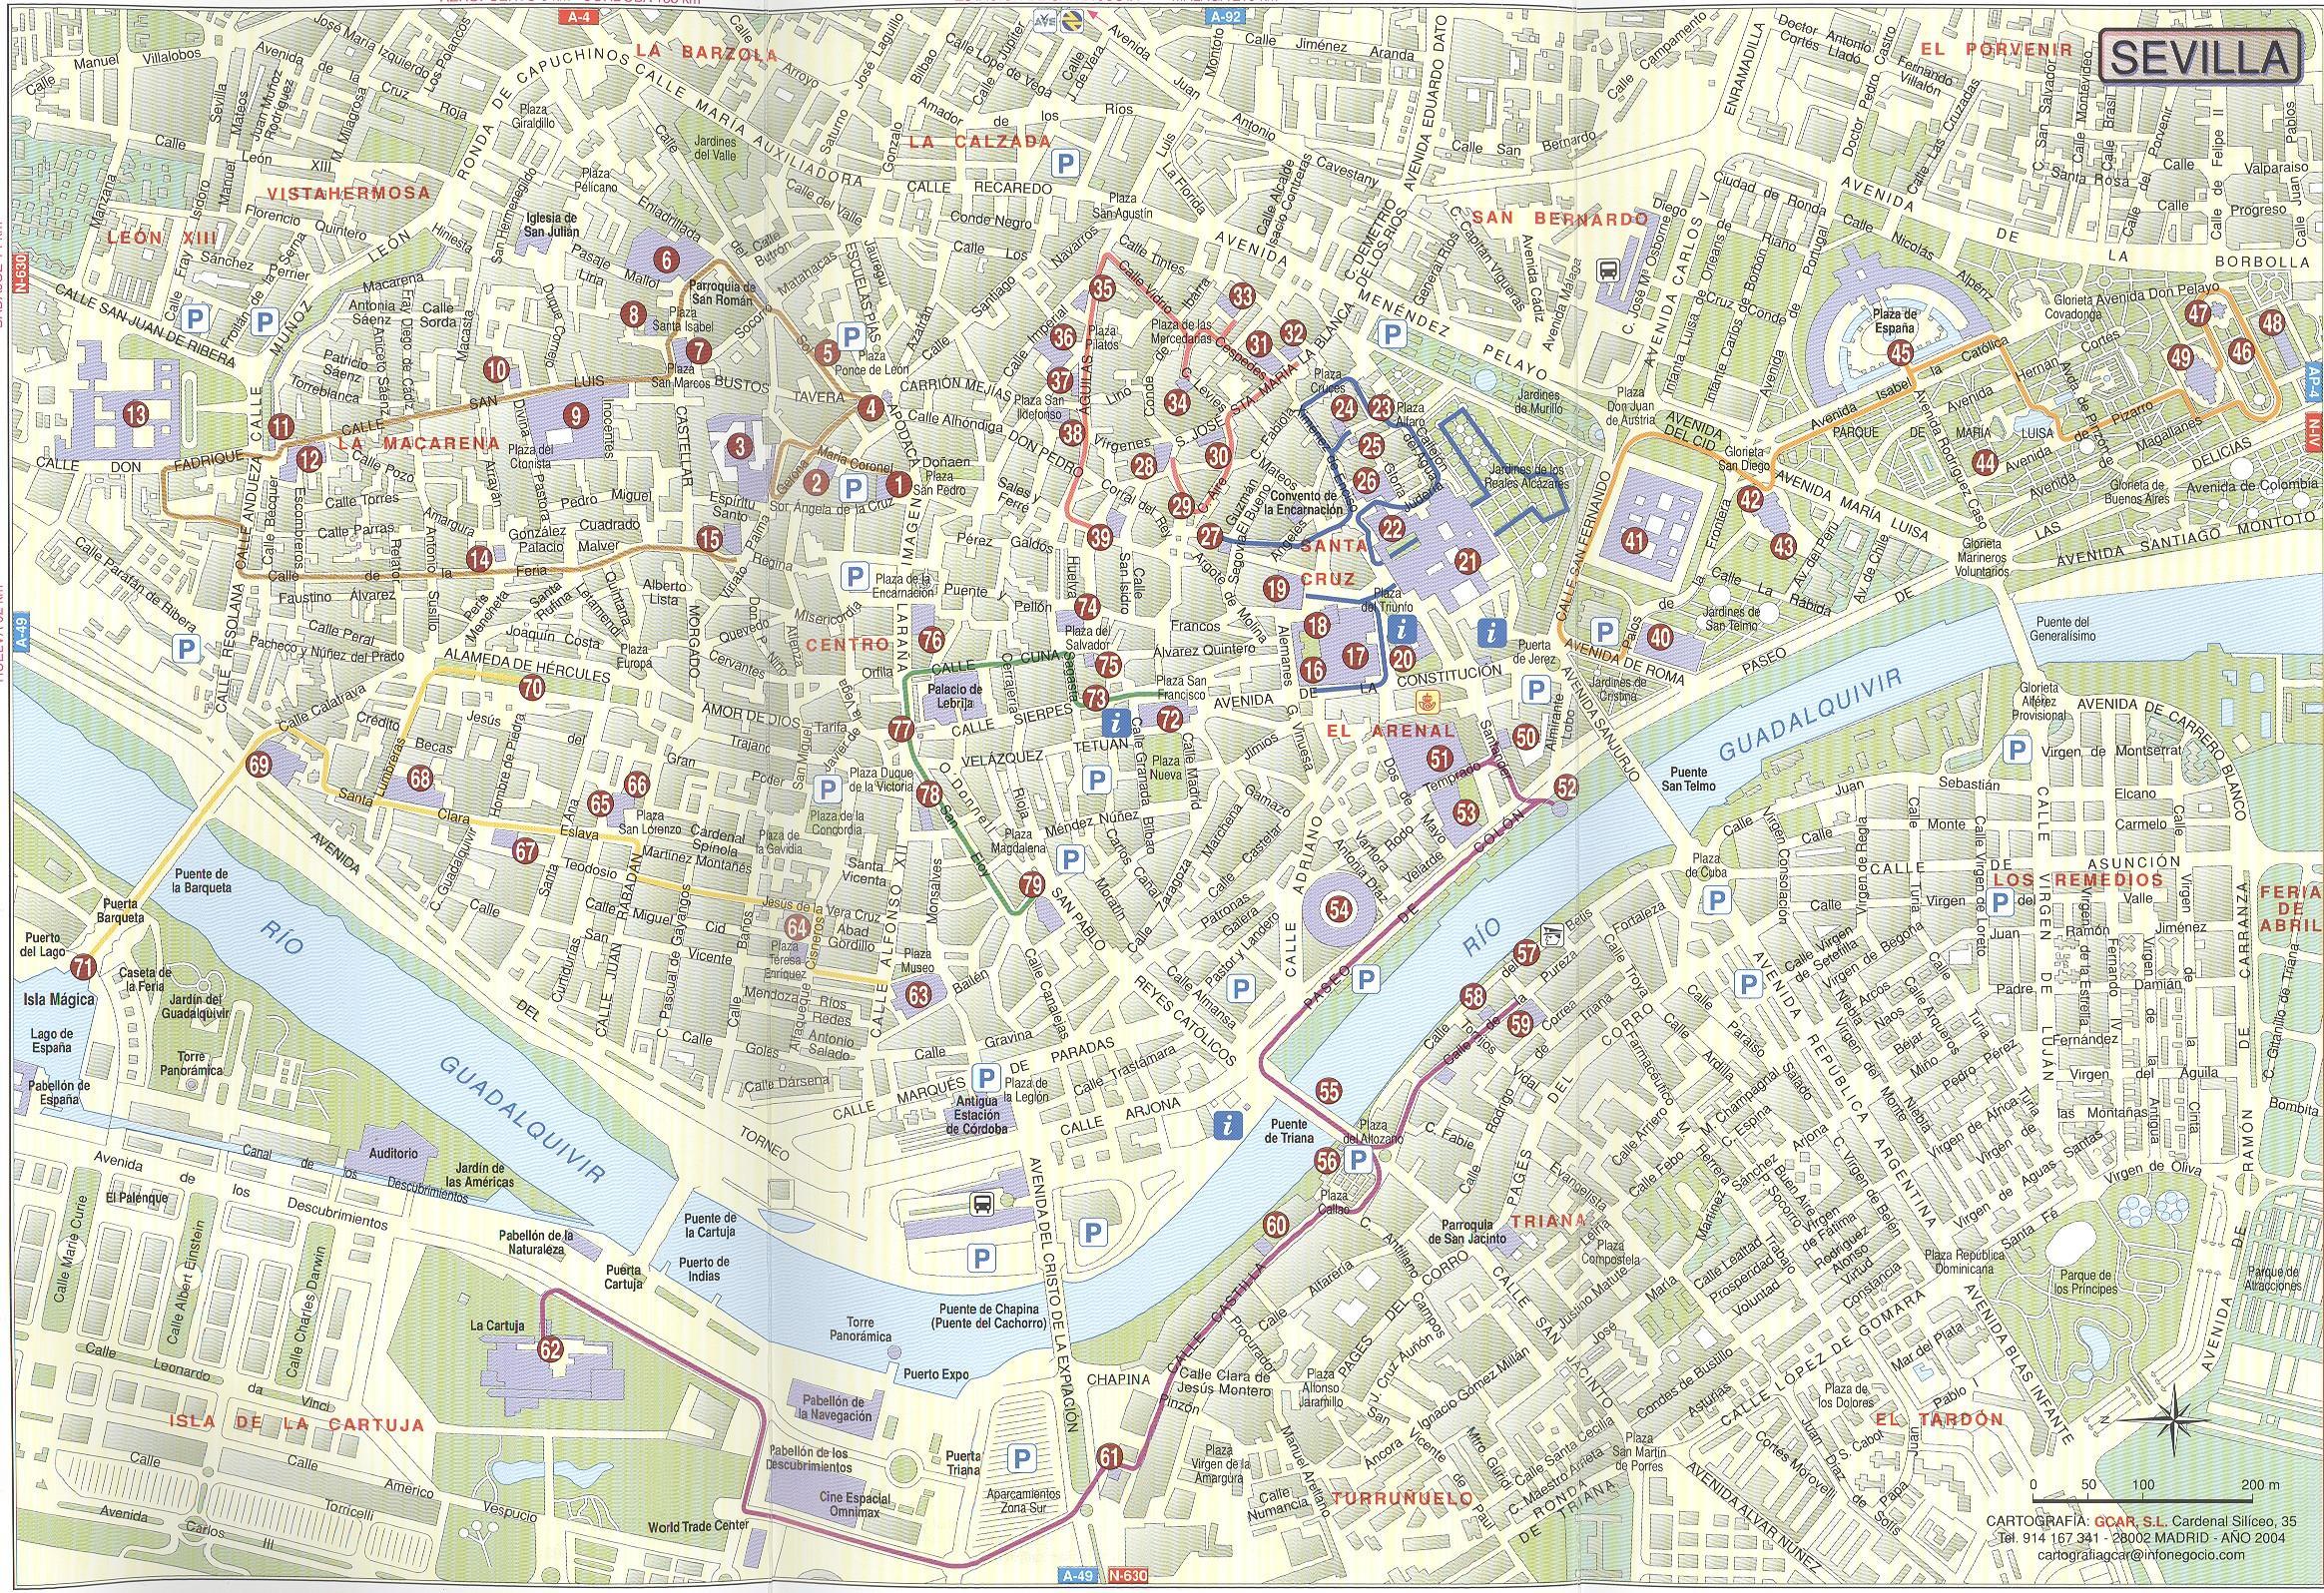 Mapa De Sevilla Capital Callejero.Sevilla Mapa Ulica Mapa Ulica Grada Seville U Spanjolskoj